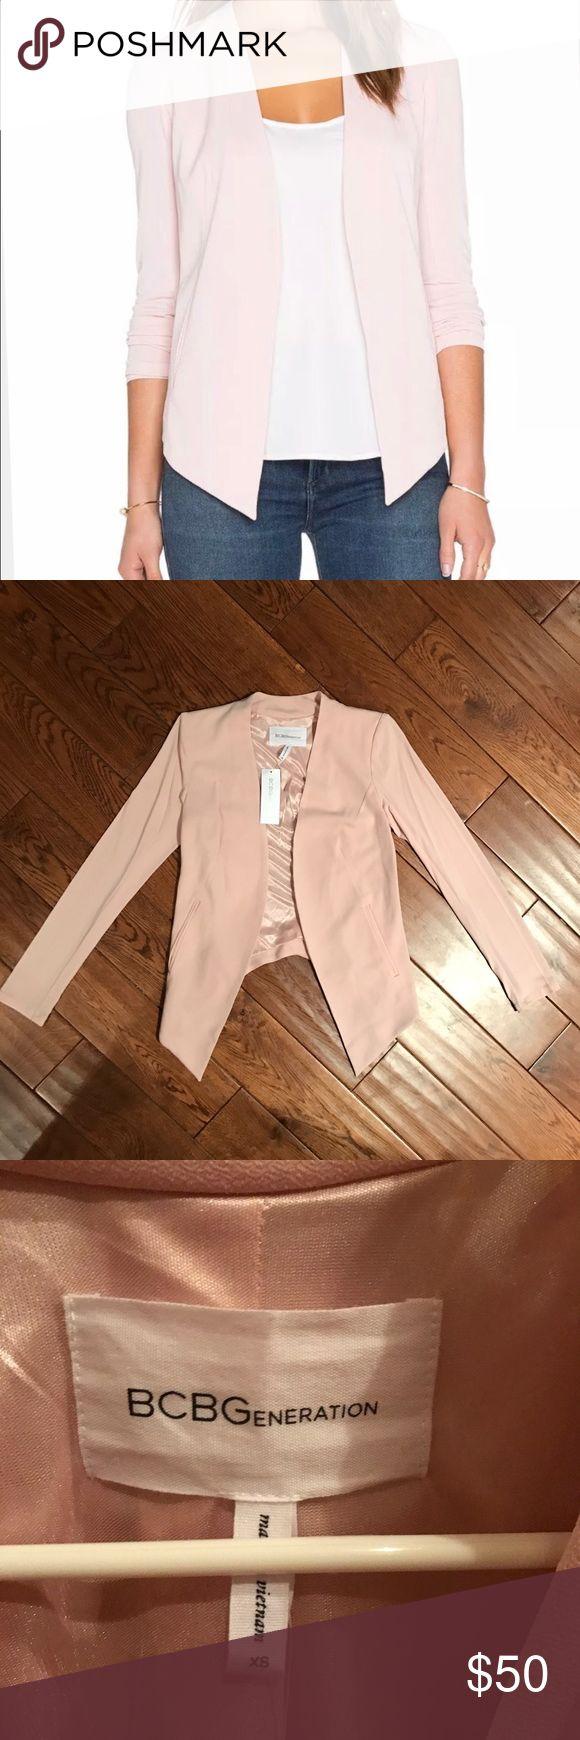 BCBGeneration blazer XS brand new Beautiful pale pink blazer in xs, still has tags. Open to trades. BCBGeneration Jackets & Coats Blazers